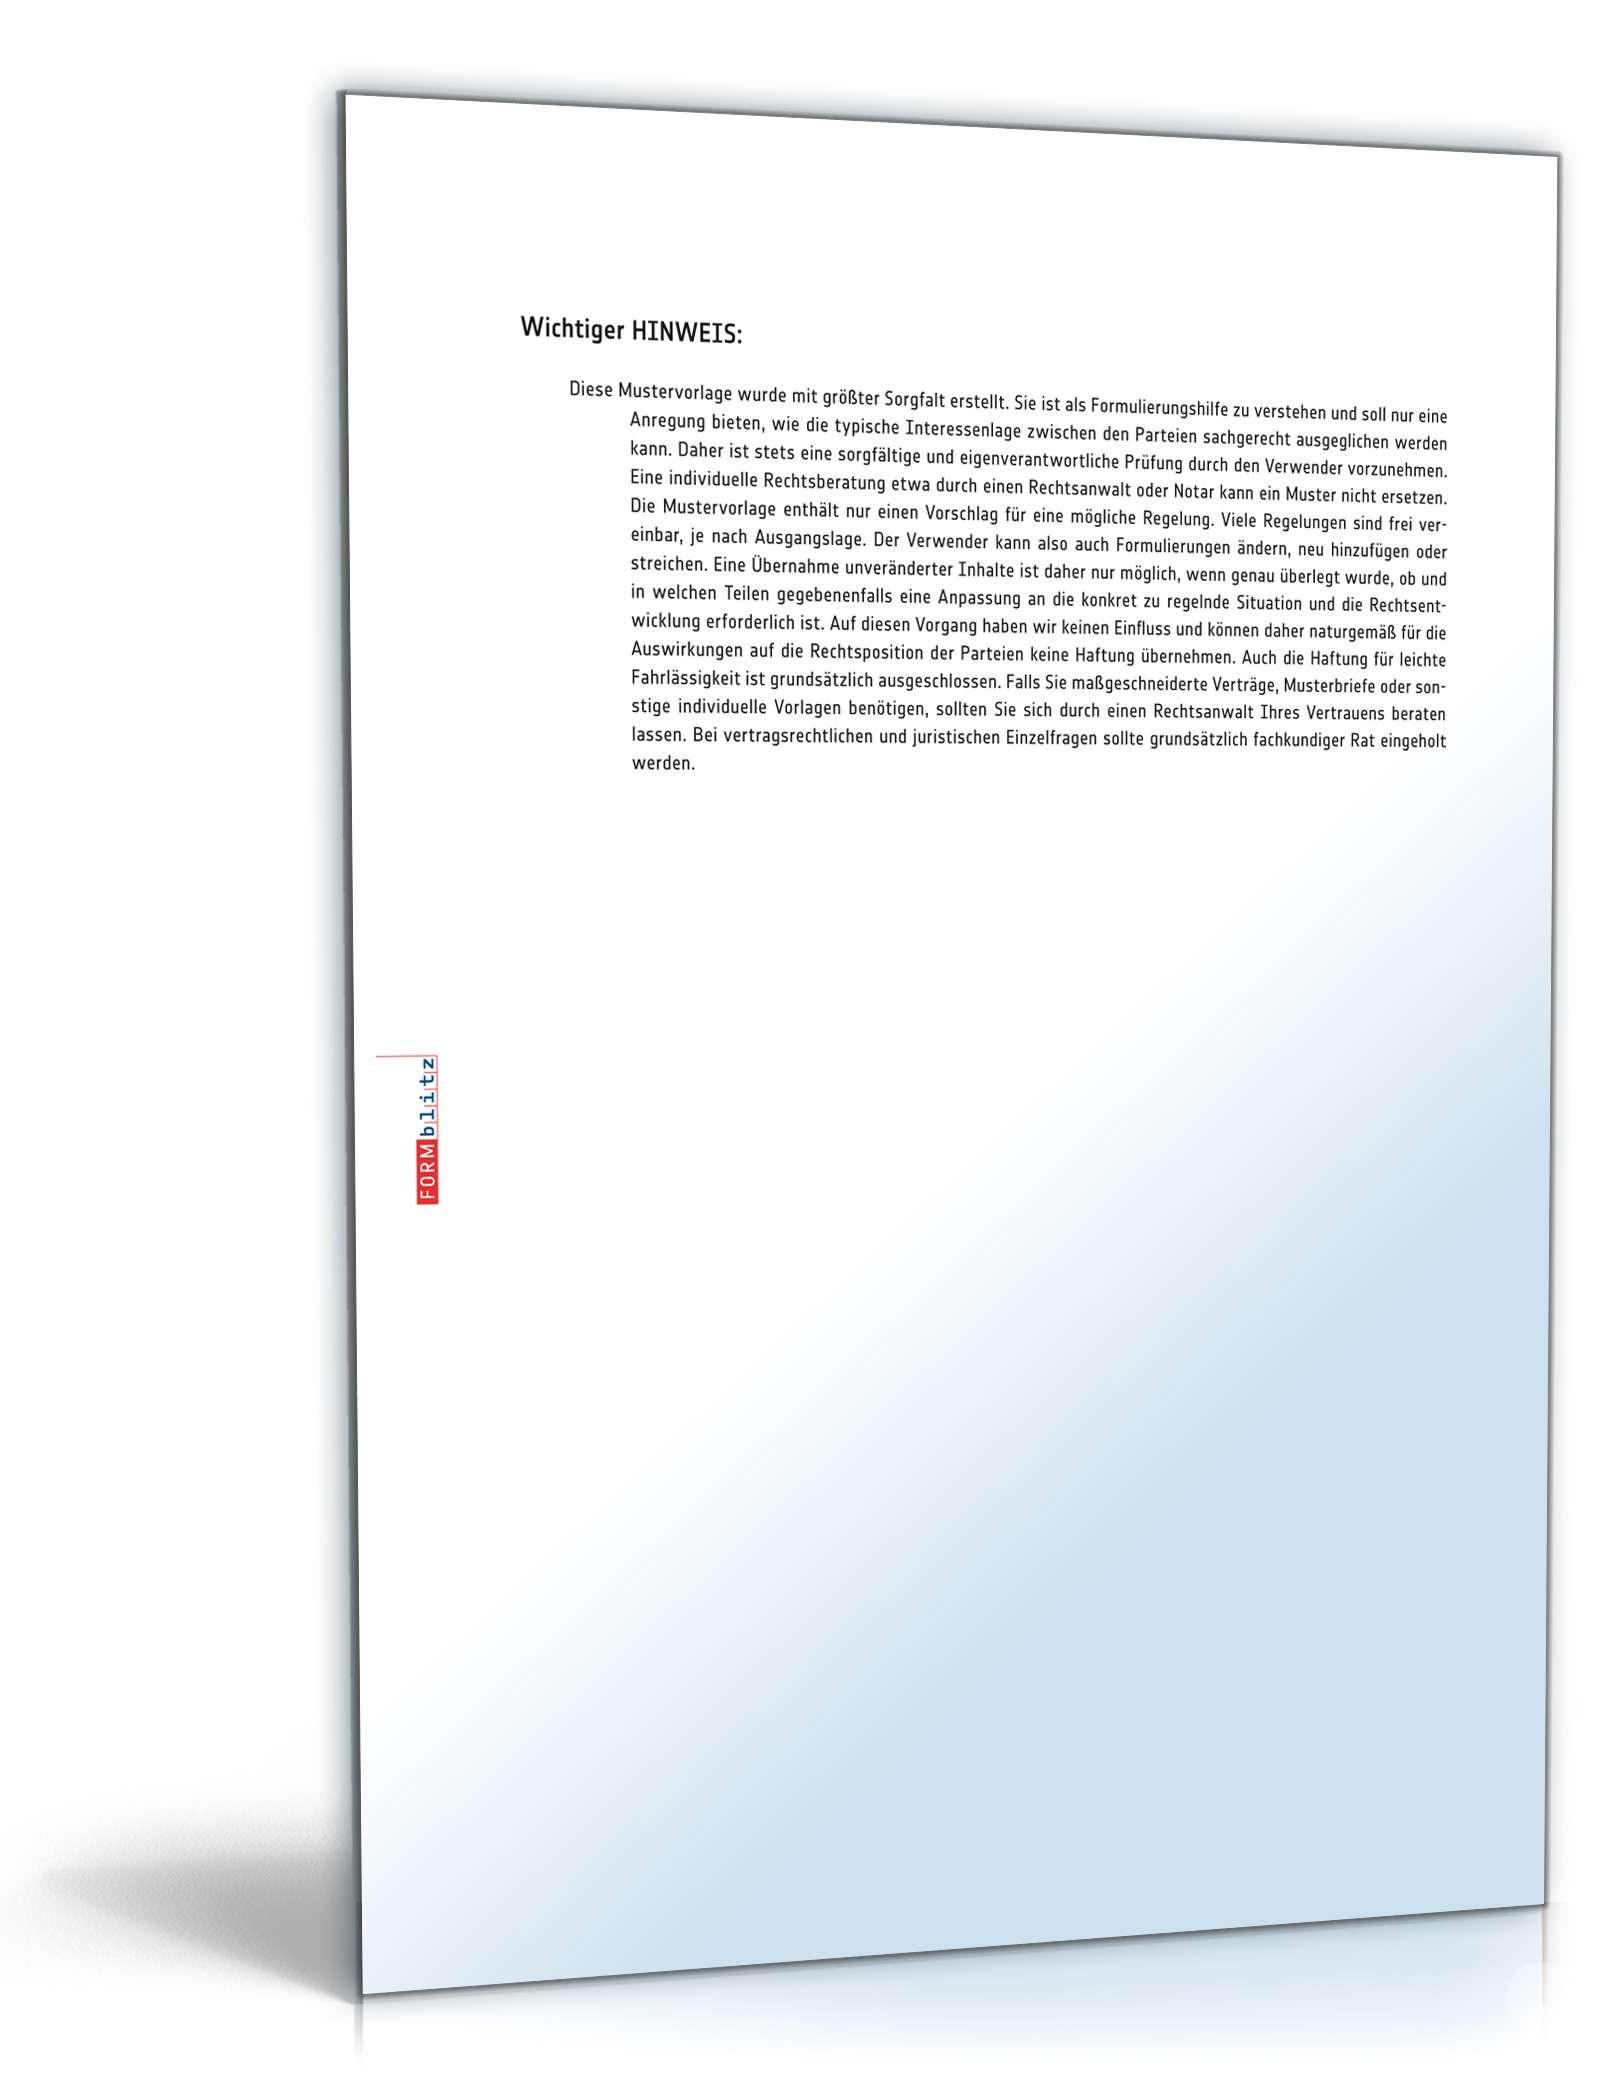 pdf seite 2 - Terminbestatigung Muster